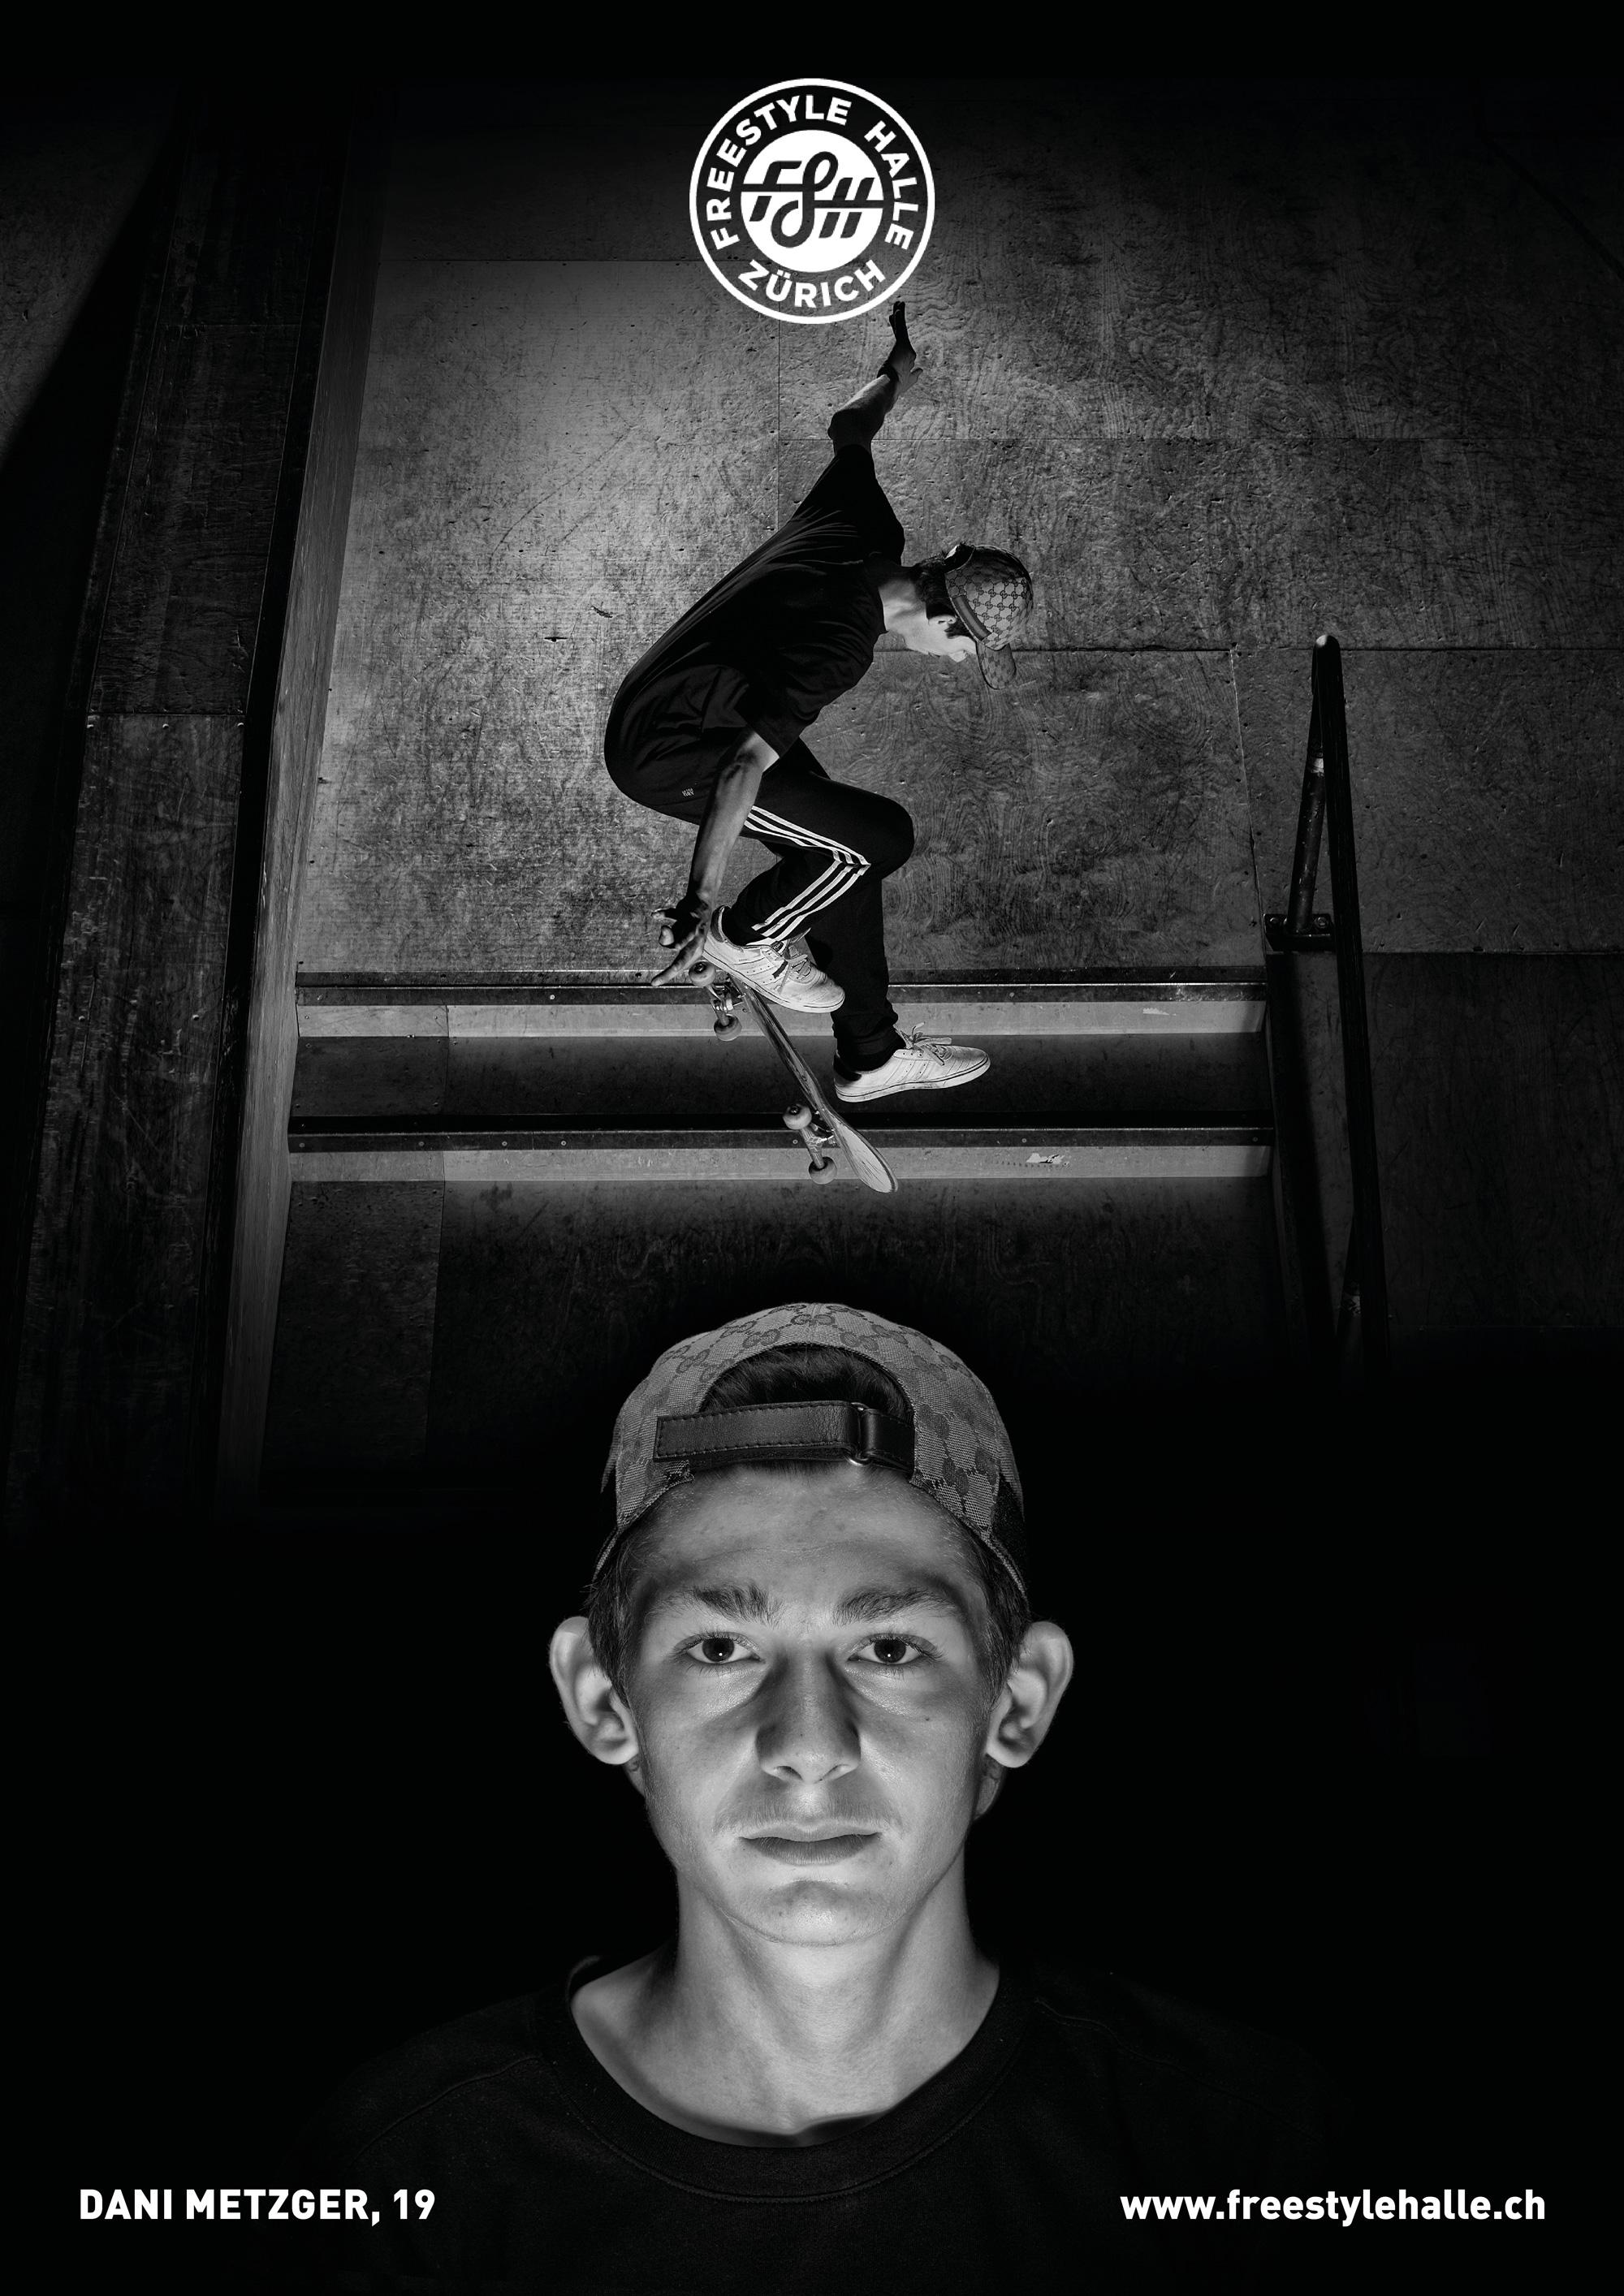 """LOCAL""  fotoseries by 📸@peterrauch  featuring the creatures of the freestylehalle biotope- today:  name  Dani G-Baws Metzger  how old are you? wie alt bist du?  19  at what age did you start skating? in welchem alter bist du das erste mal geskatet?  about 12, mit etwa 12  where are you from? woher kommst du?  k10, Iran  what do you get out of skating? was gibt dir skaten?  joy, homies and a few broken bones/ freude, homies und ein paar knochenbrüche  vil netti lüt und neui kollege  are you member of a skate crew? bist du in einer crew?  team henny  favorit trick? lieblings trick?  fs 360 shuv it    #freestylehalle #fshzh #local #zurich #skateboarding #biodiverisityofskateboarding"